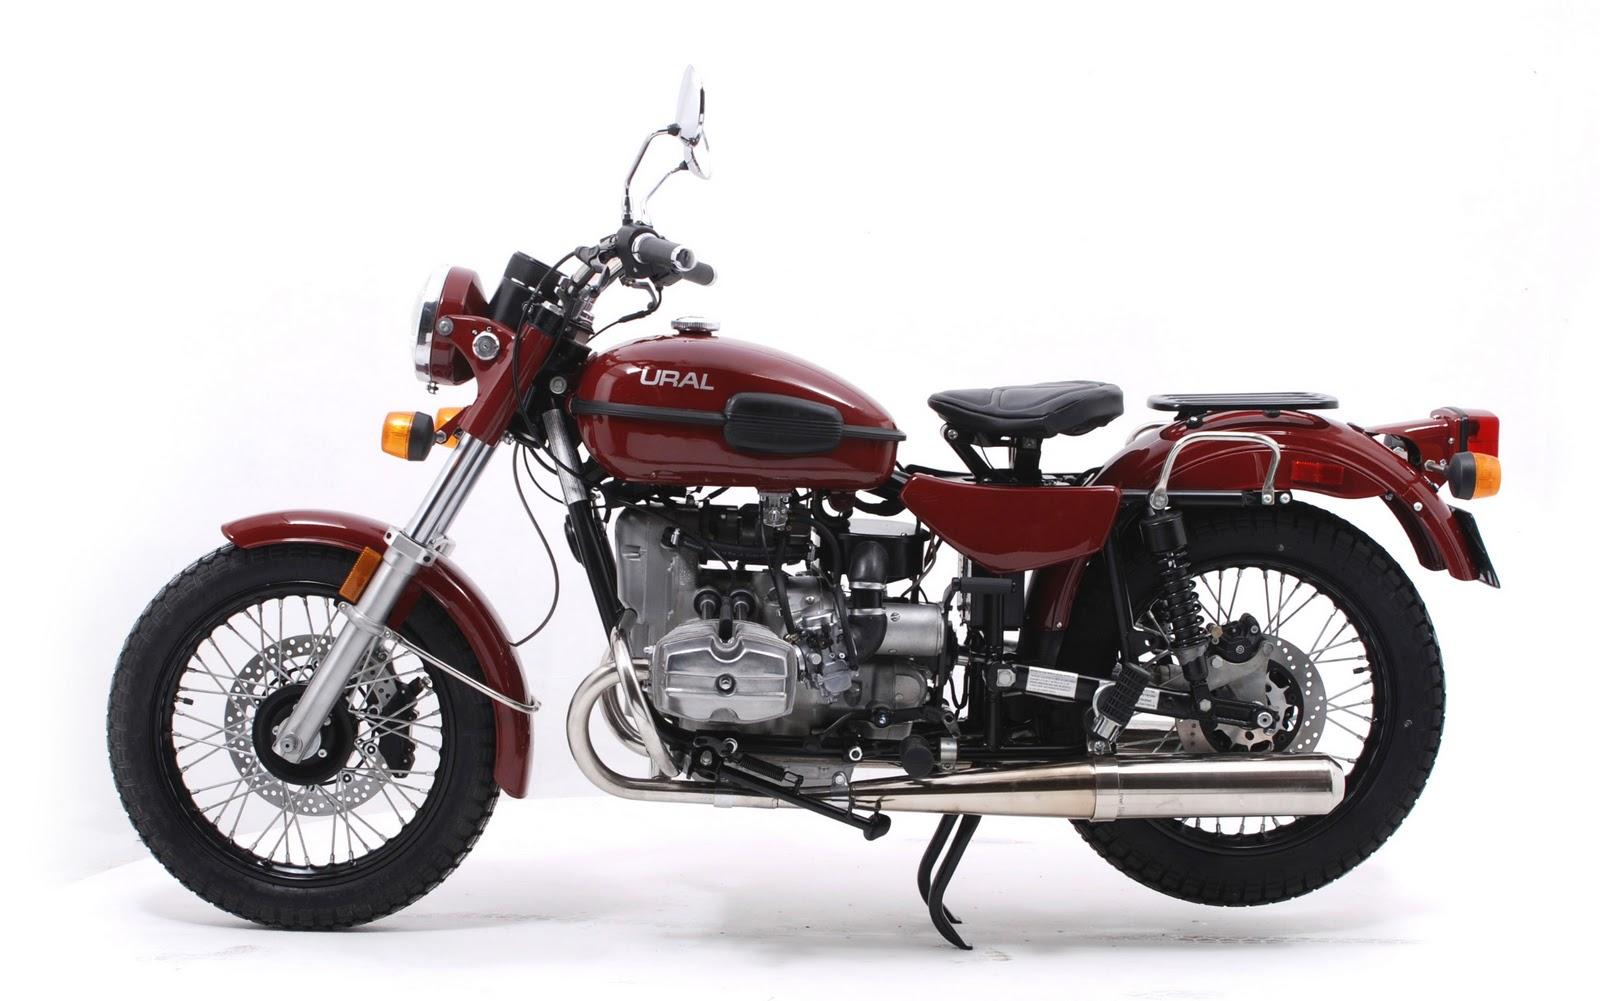 Фото мотоцикла иж юпитер